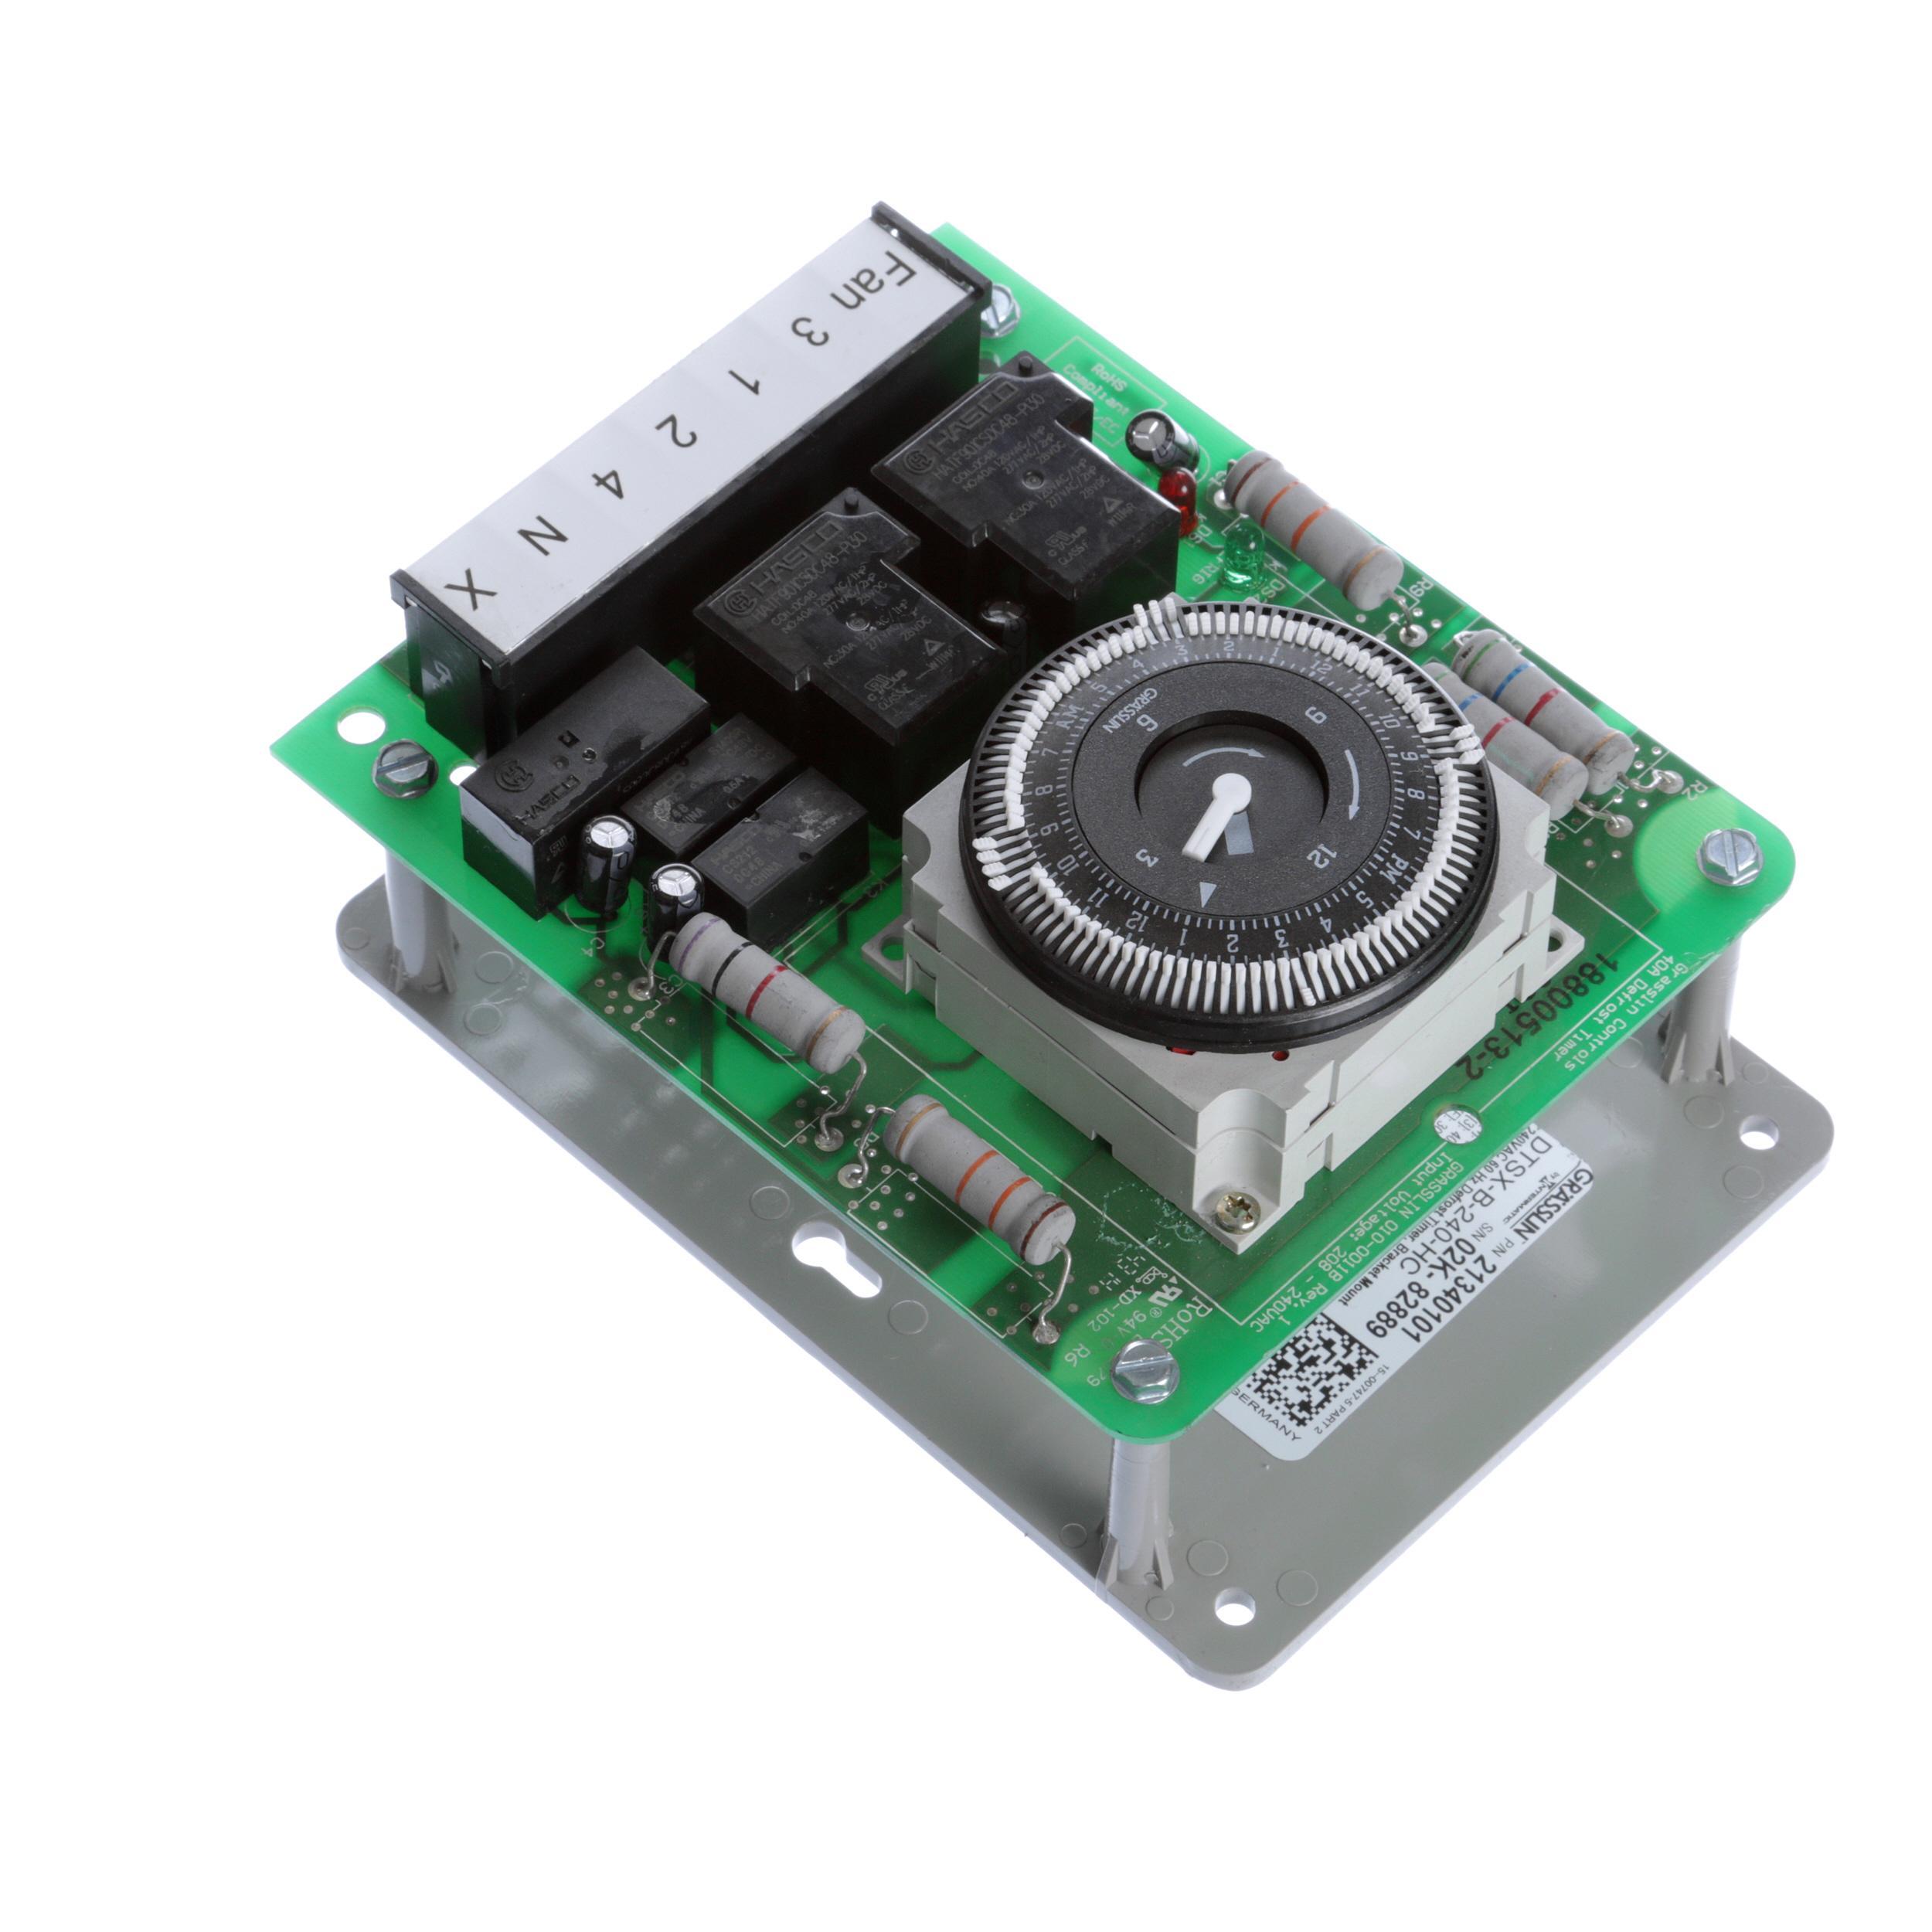 medium resolution of heatcraft defrost timer 40 amp 230v 60hz dtsx240 part 21340101 rh heritageparts com 21340101 timer wiring diagram